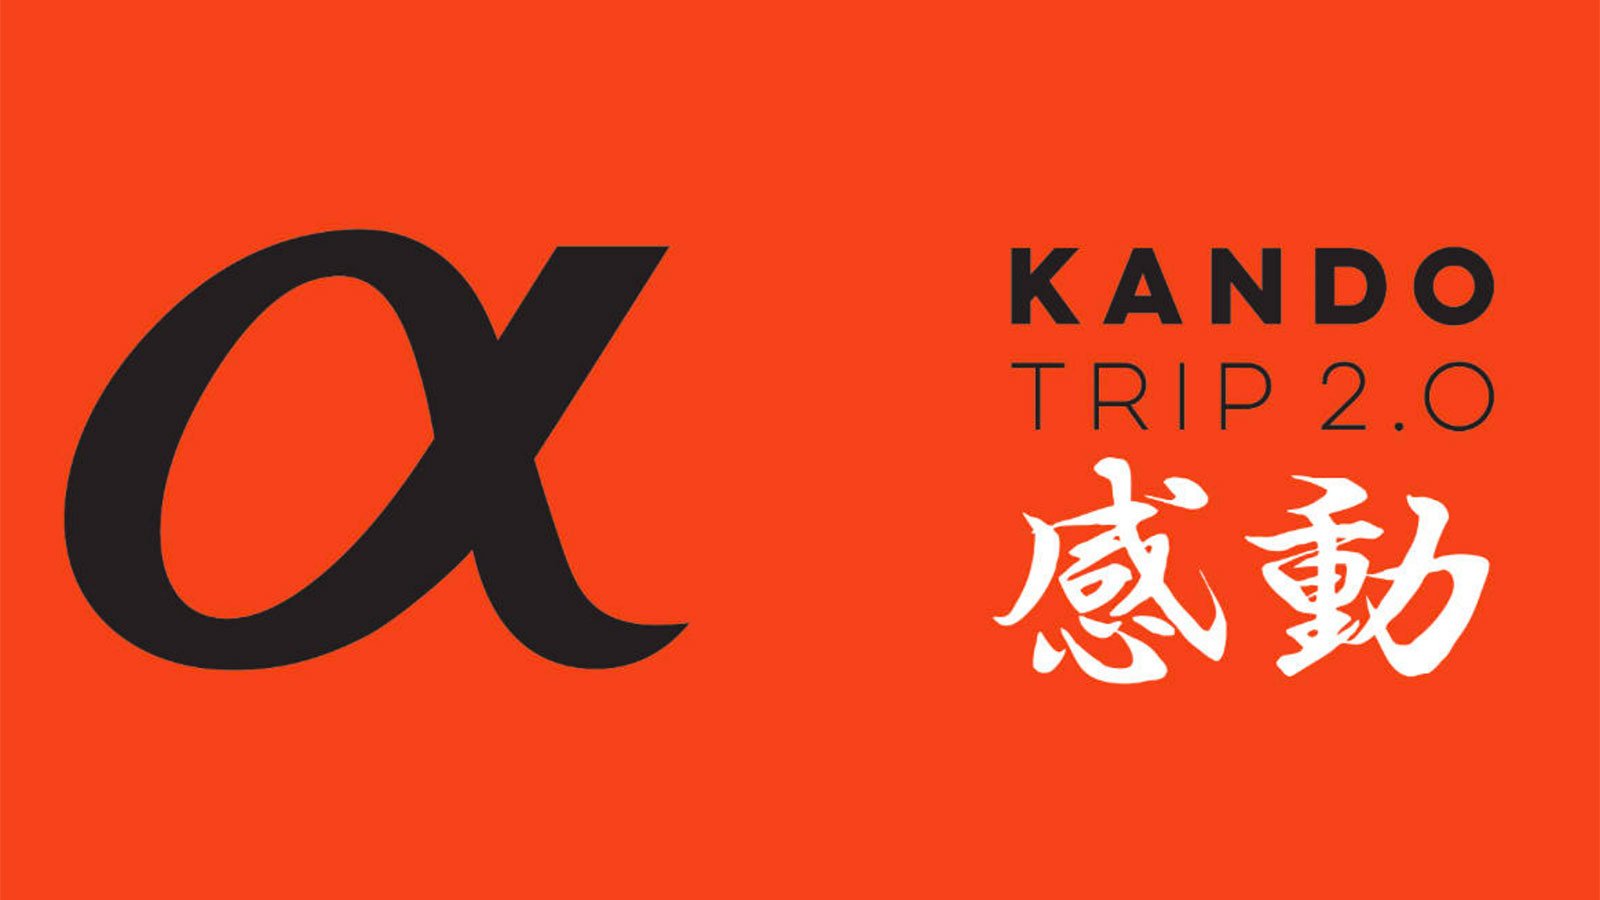 Kando Trip 2.0